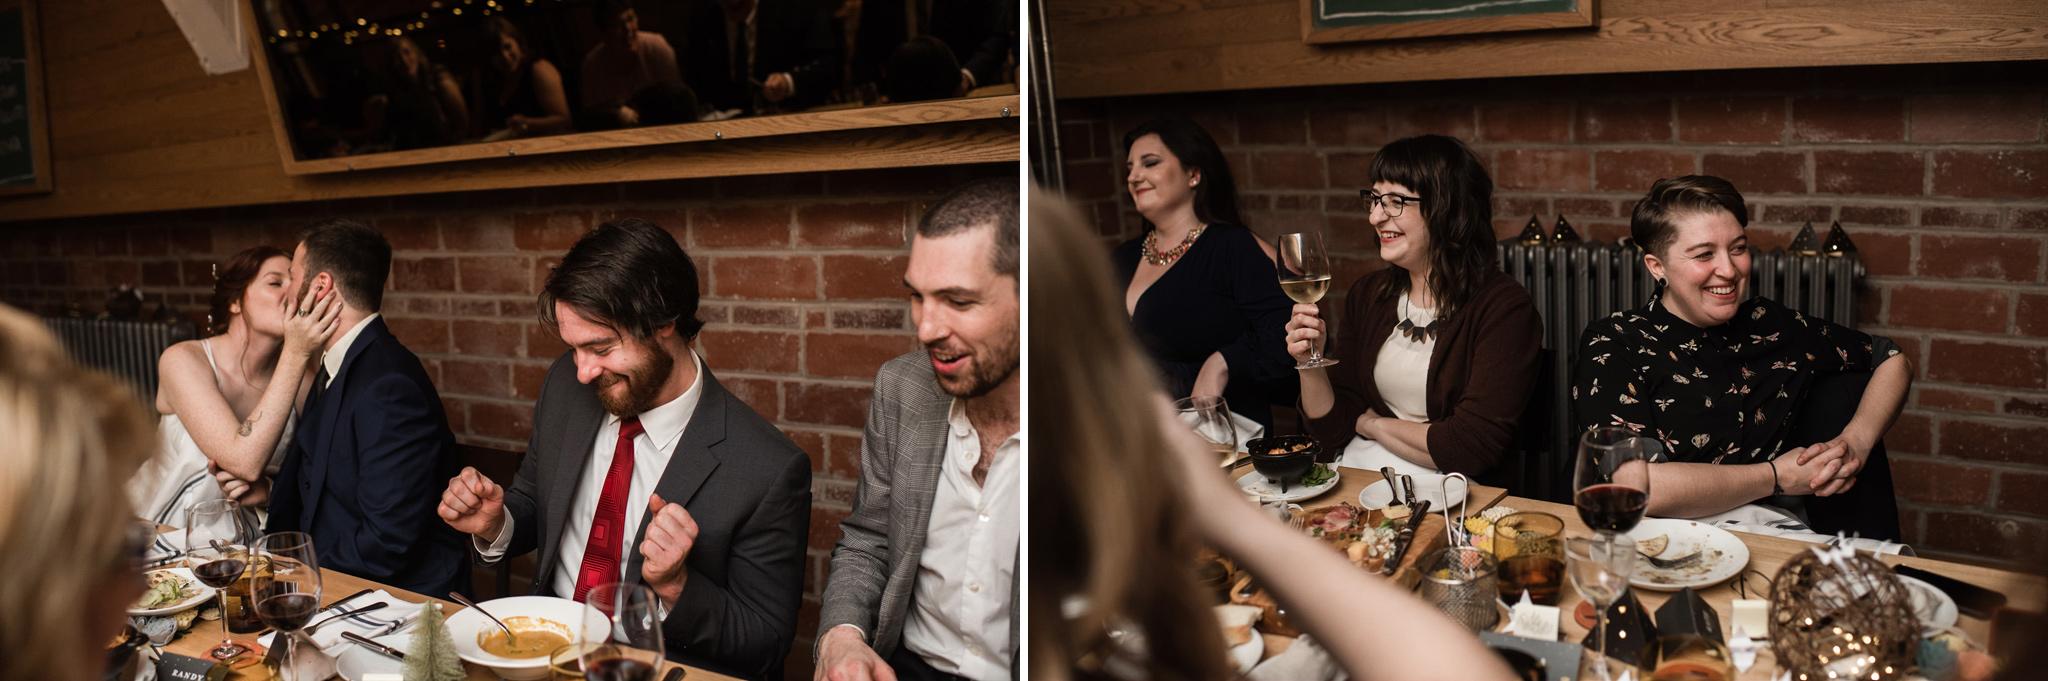 093-intimate-restaurant-wedding-toronto-wedding-photographer.jpg